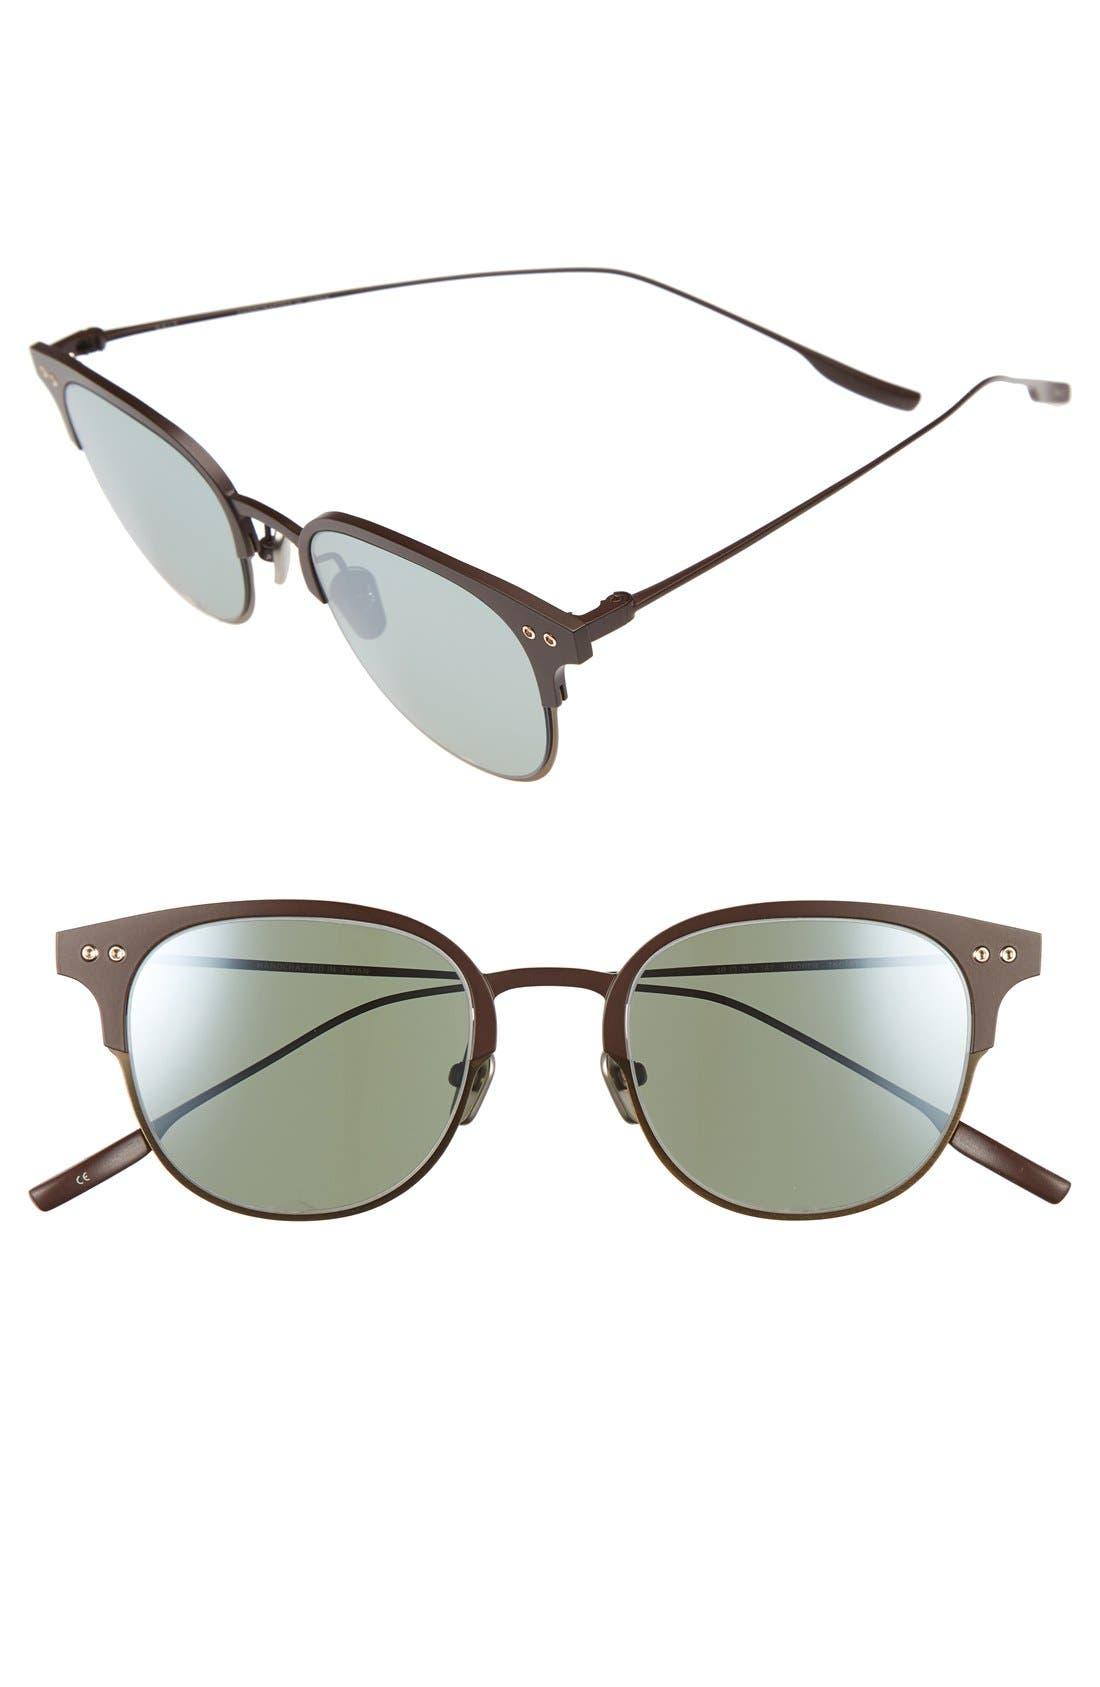 Hooper 48mm Polarized Sunglasses,                             Main thumbnail 1, color,                             220